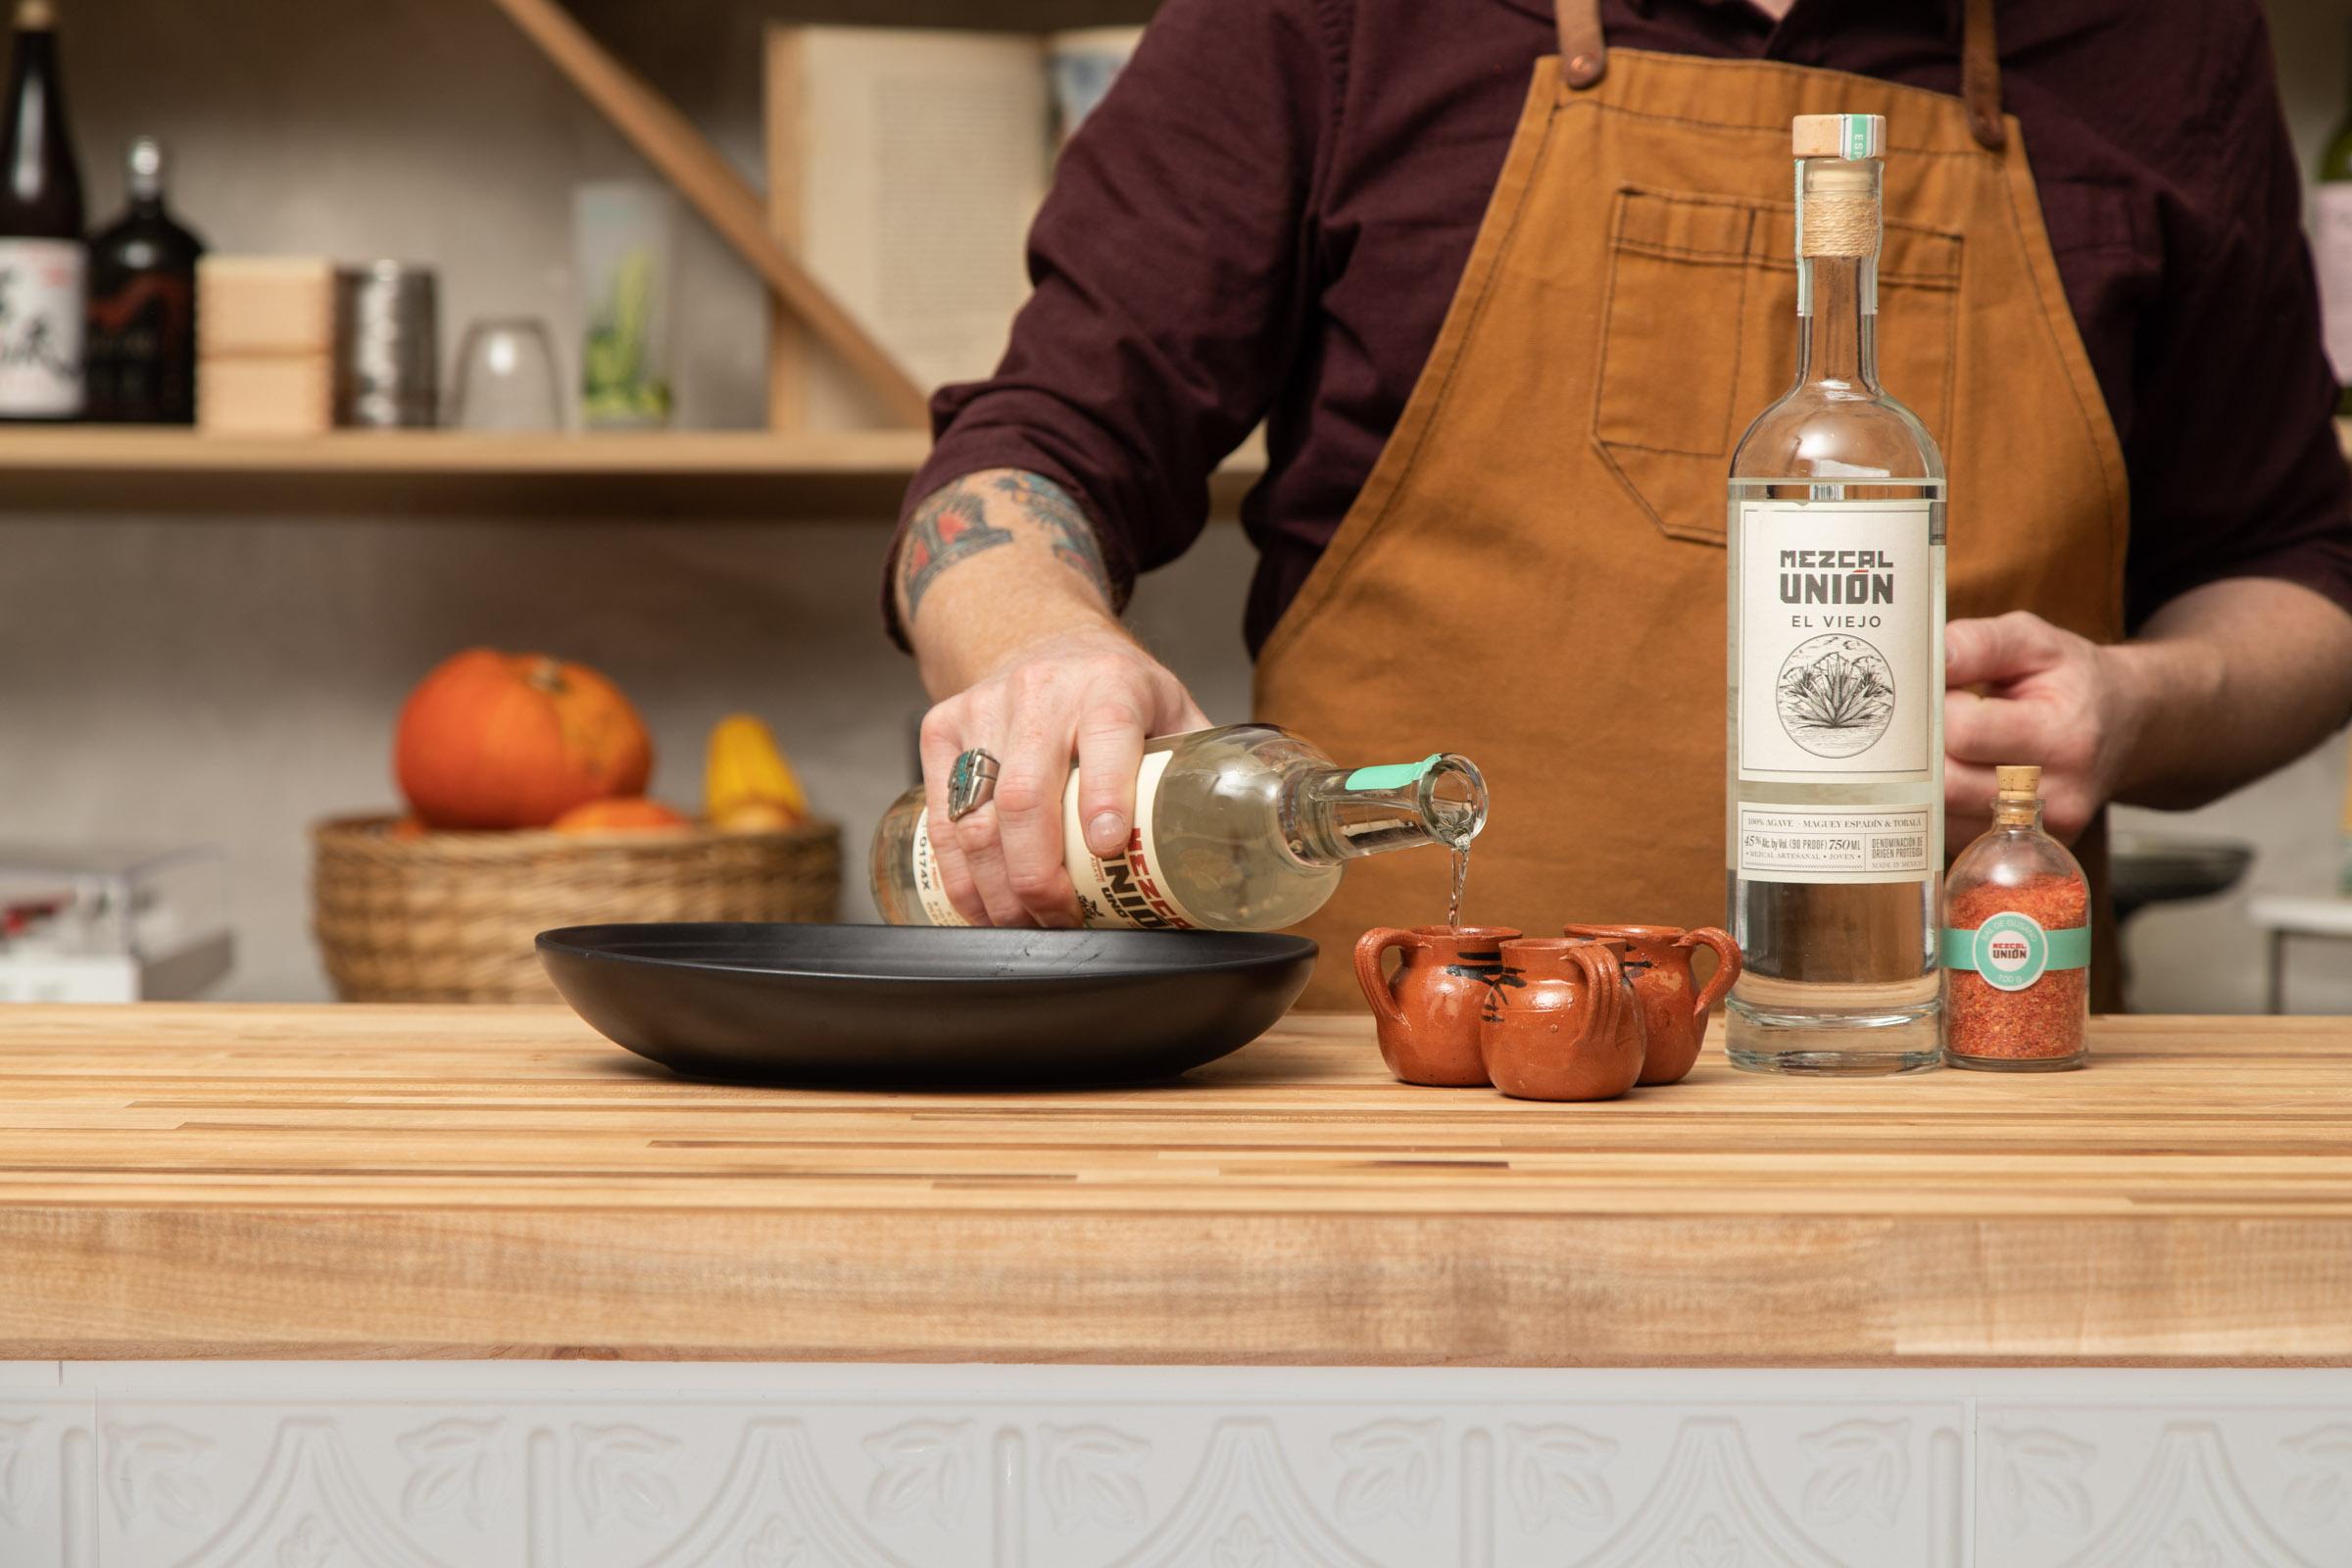 2018-11-29 Derby Cocktail, David Dines-1632.jpg